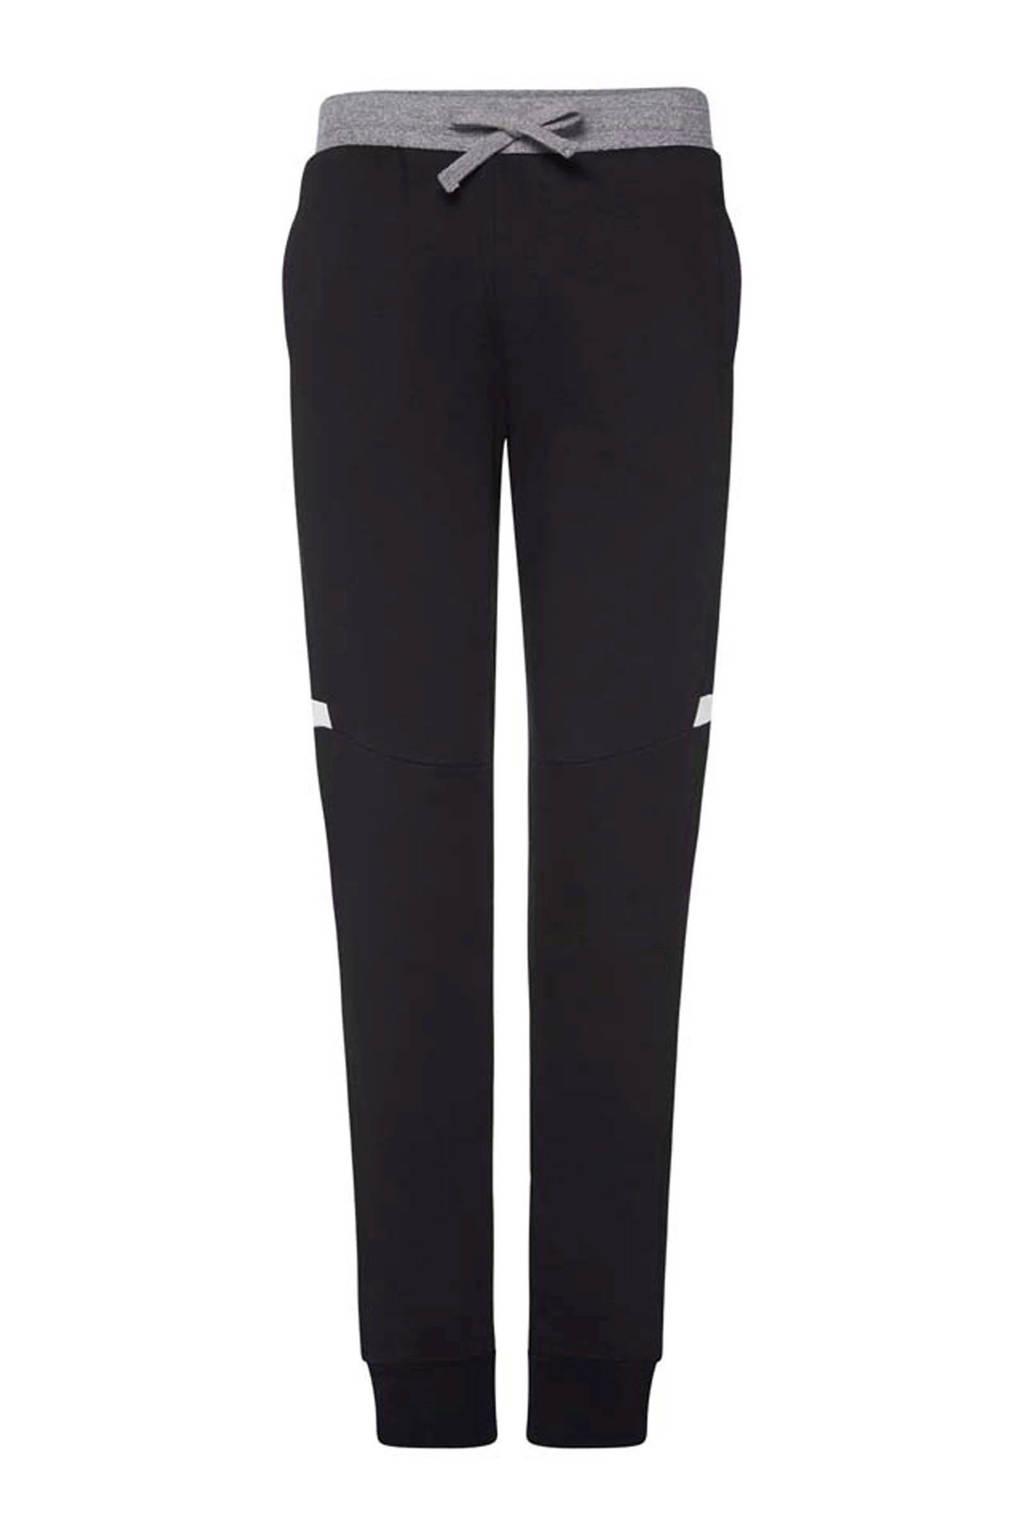 Charlie Choe joggingbroek Relax zwart, Grijs/zwart/wit